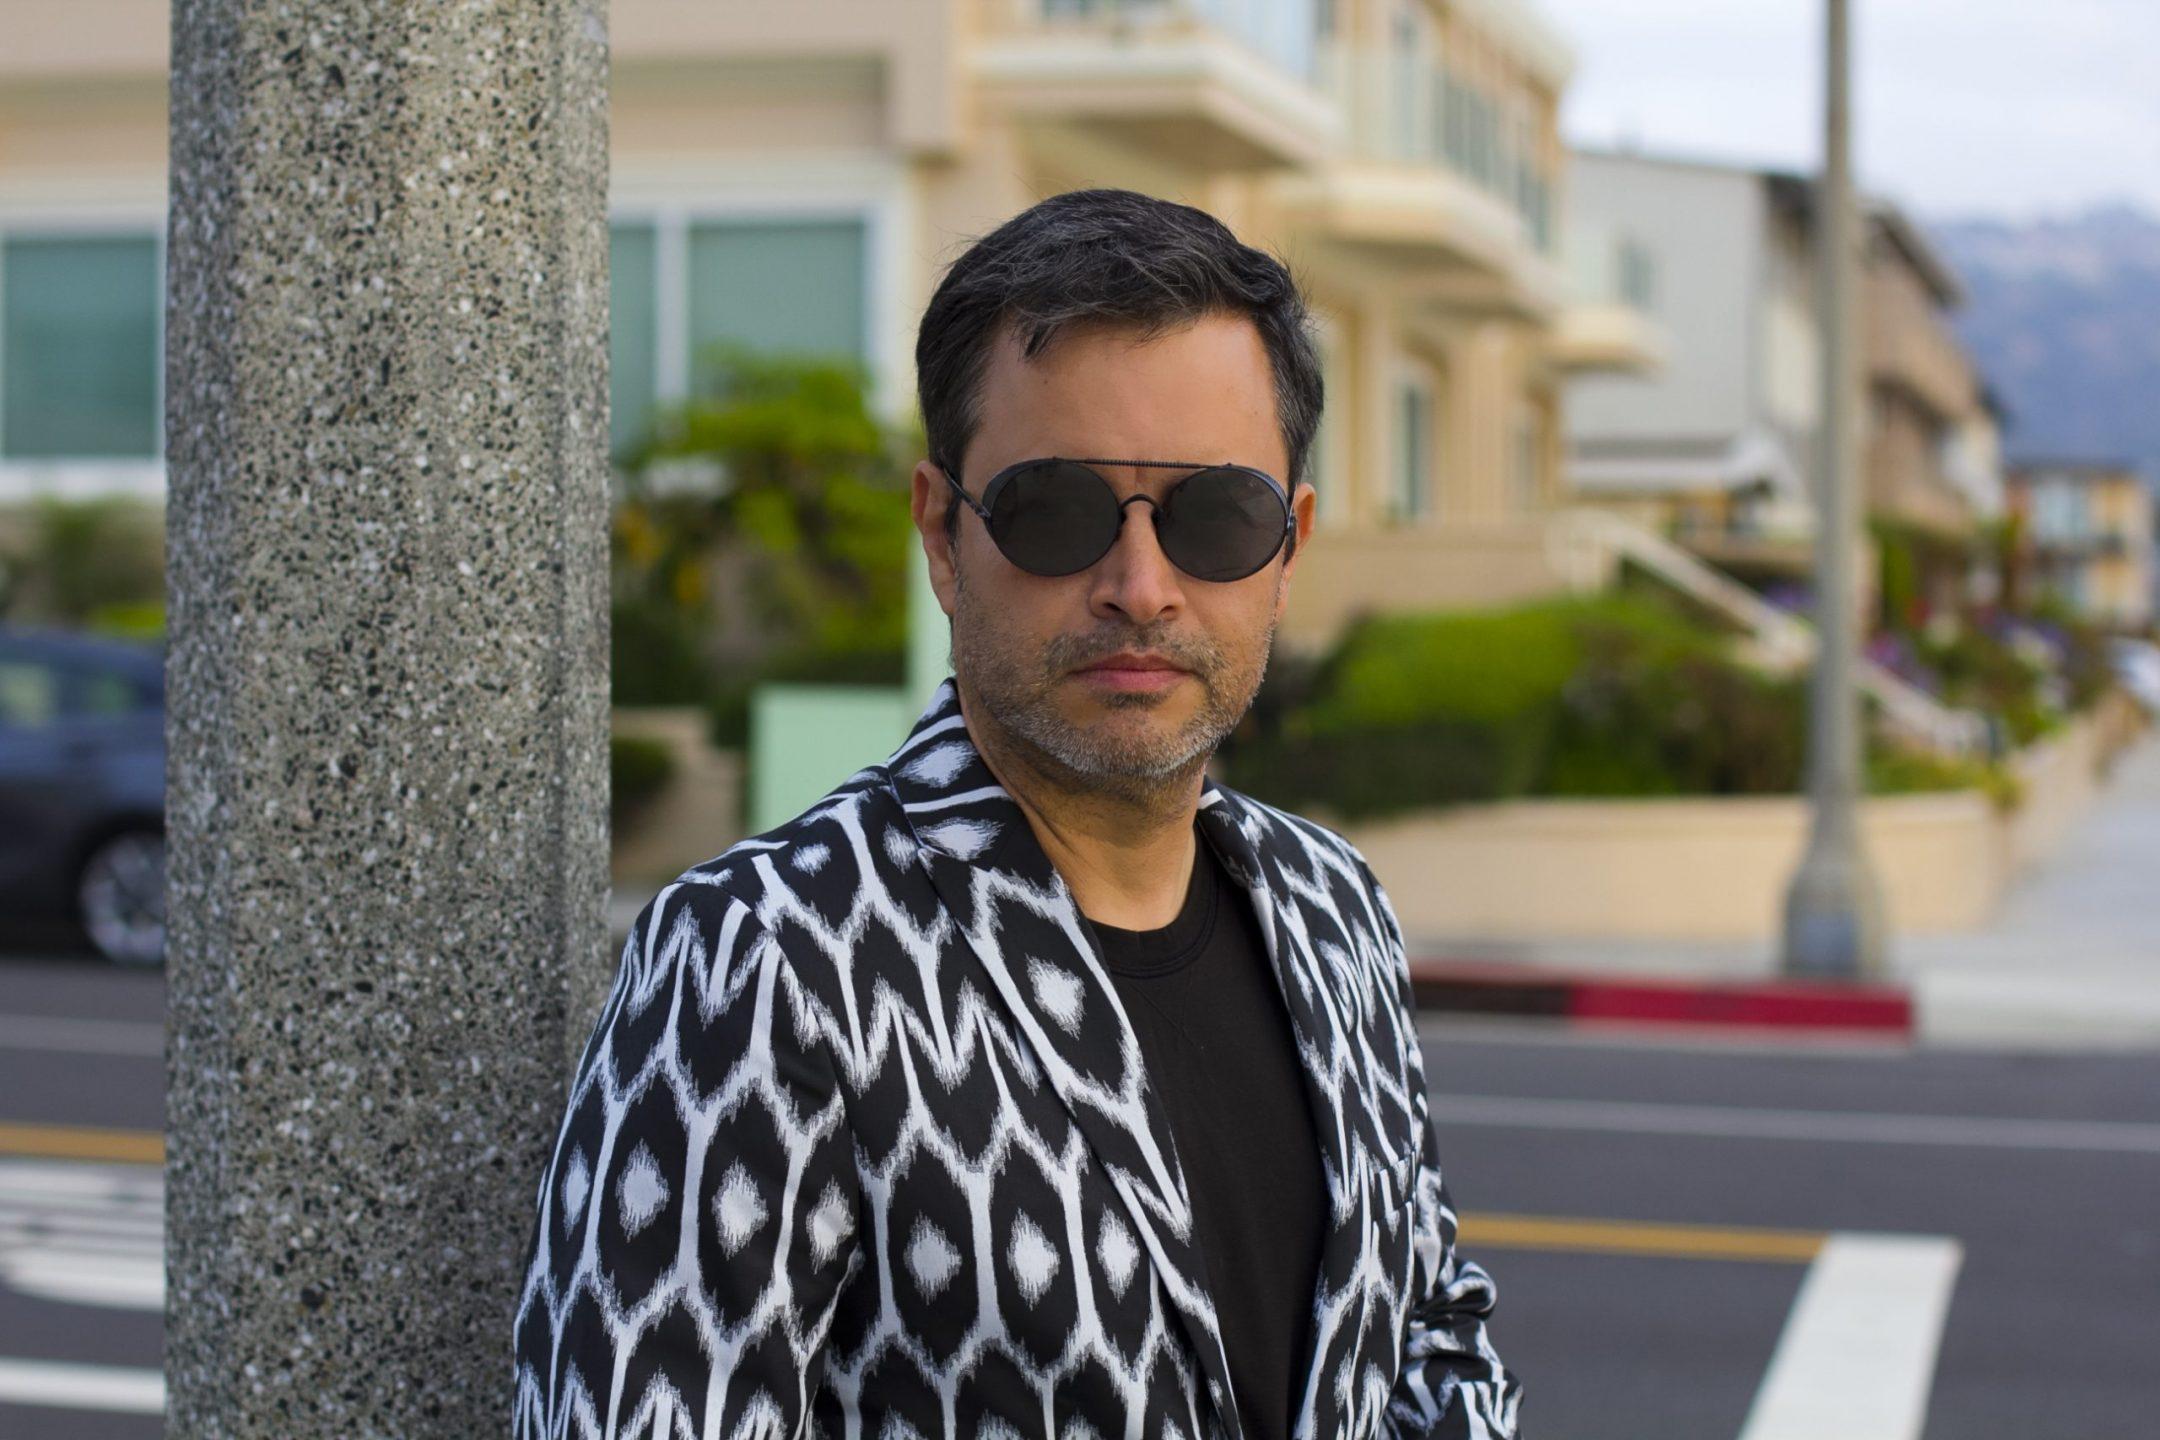 Mr. Turk Men's Suit styled by Douglas Lagos